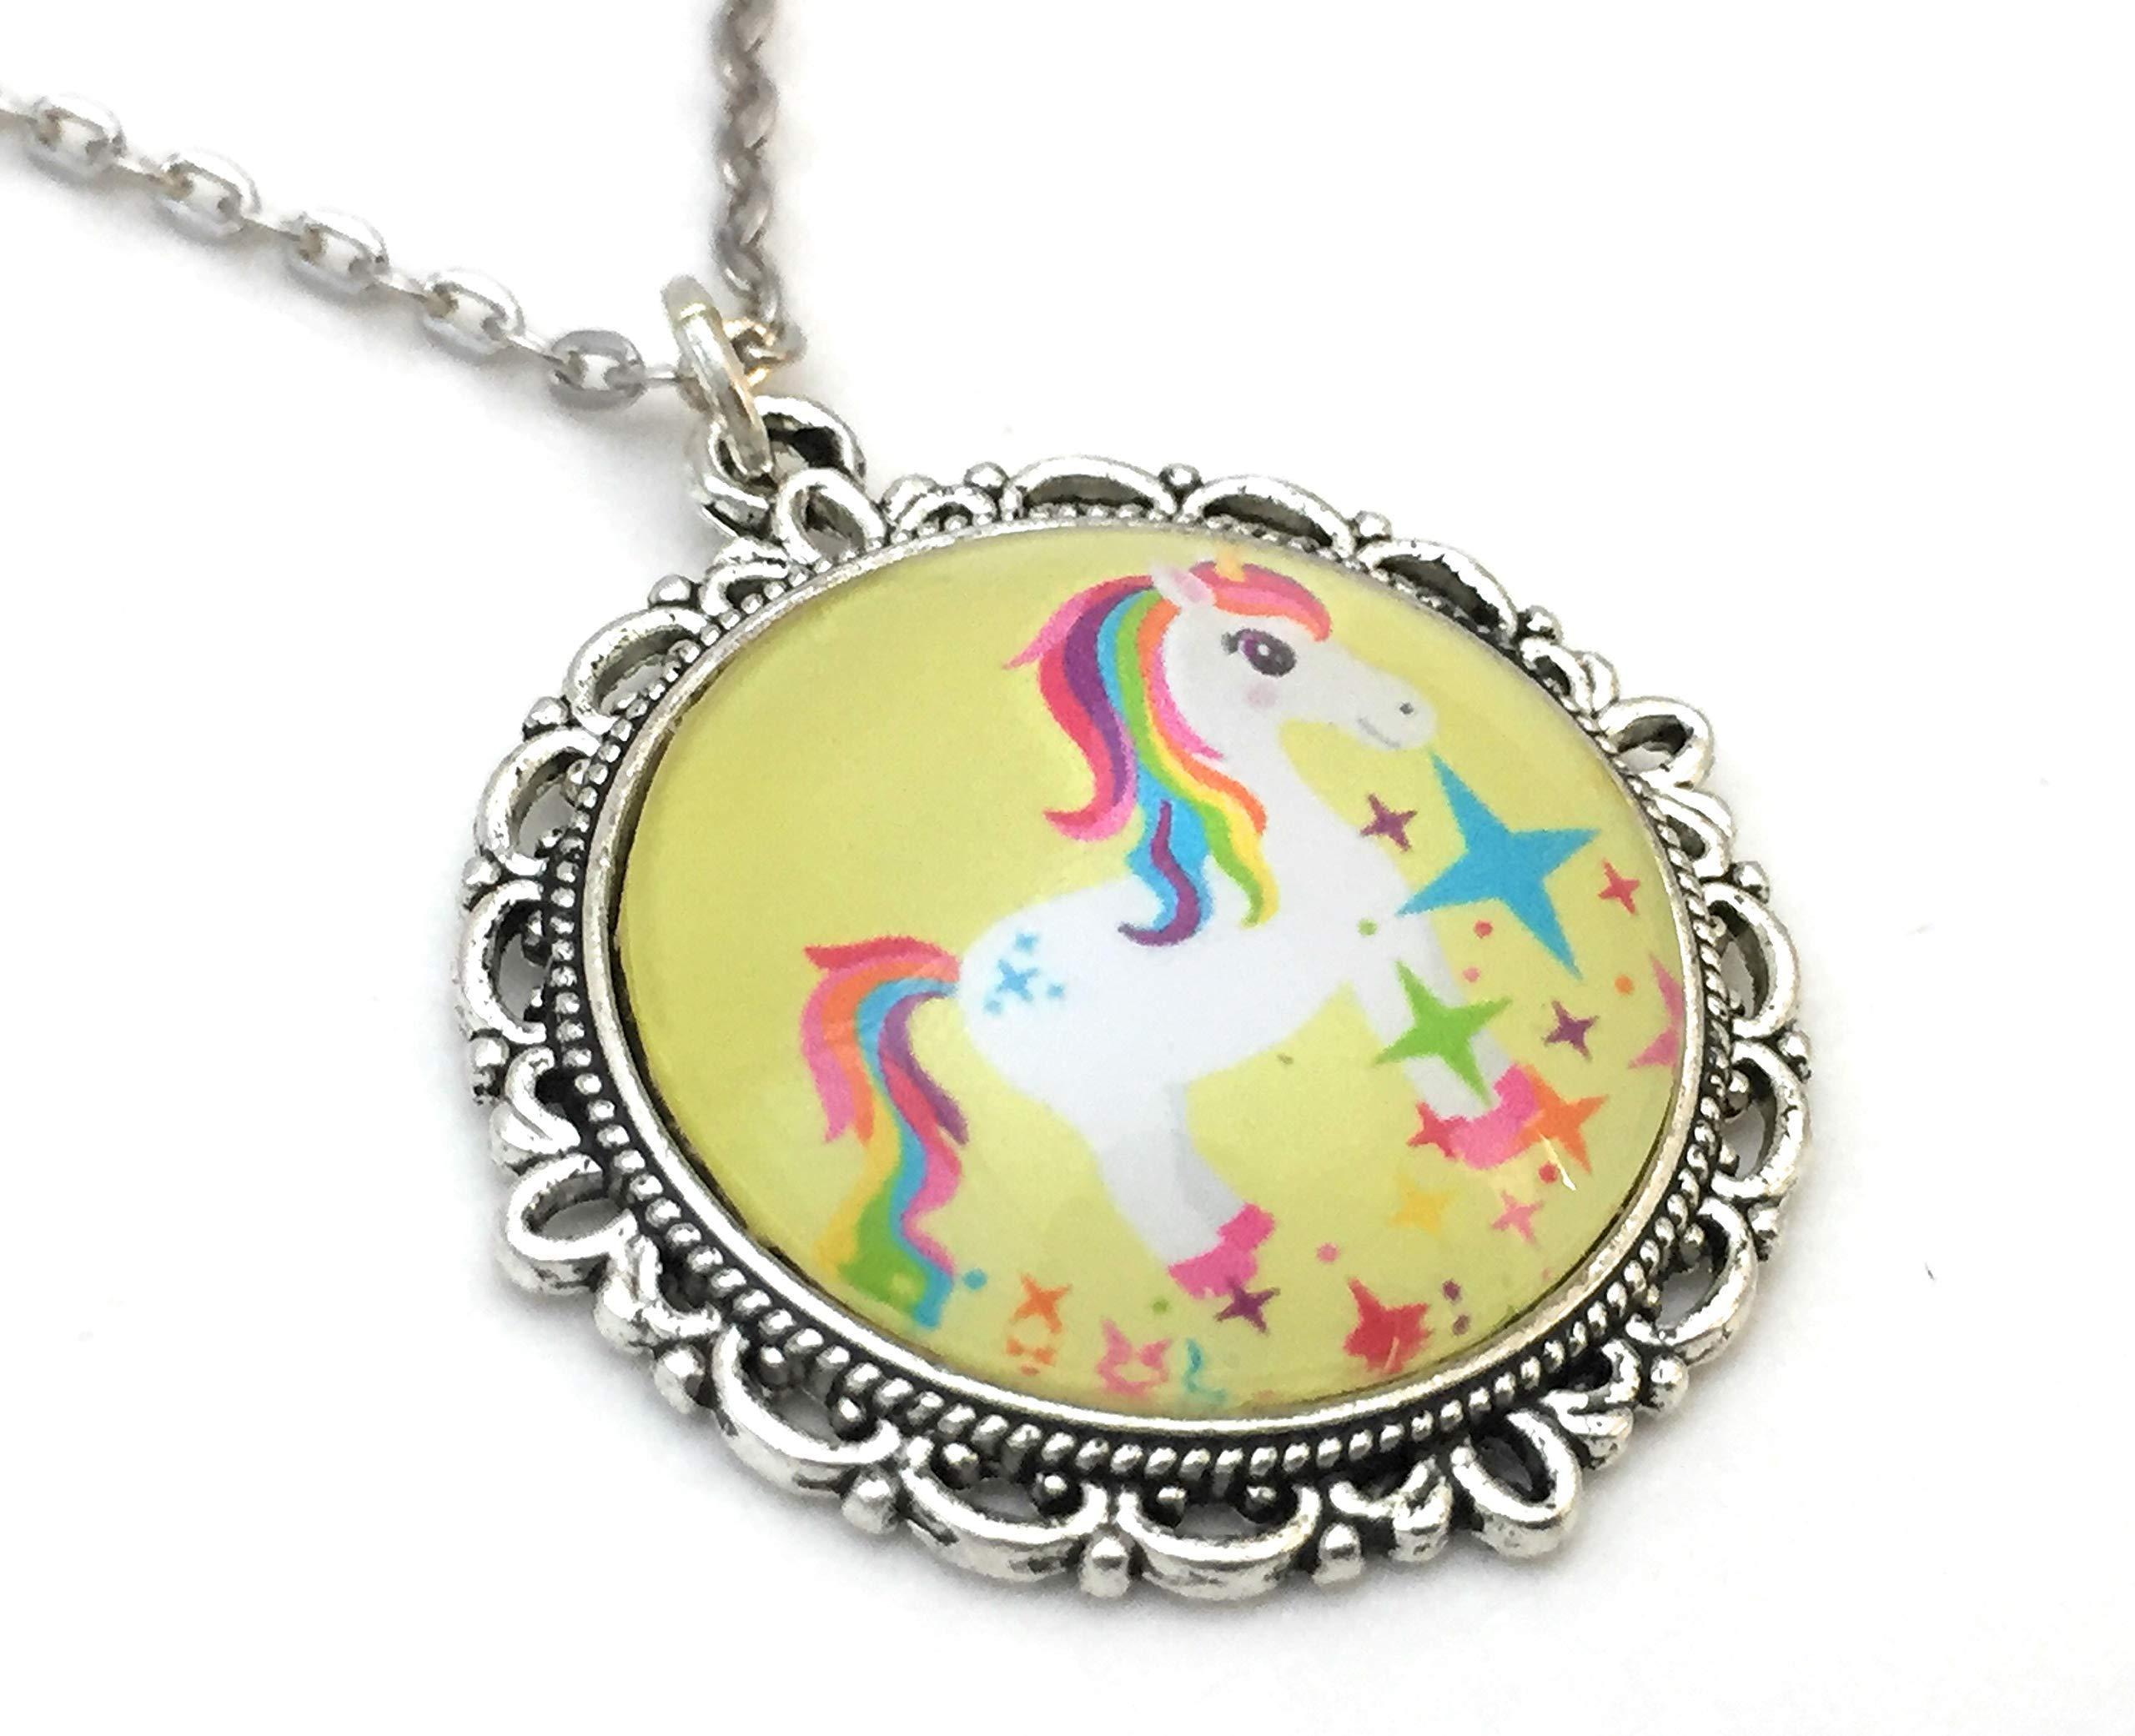 Unicorn Necklace - Rainbow Colors - Handmade 4